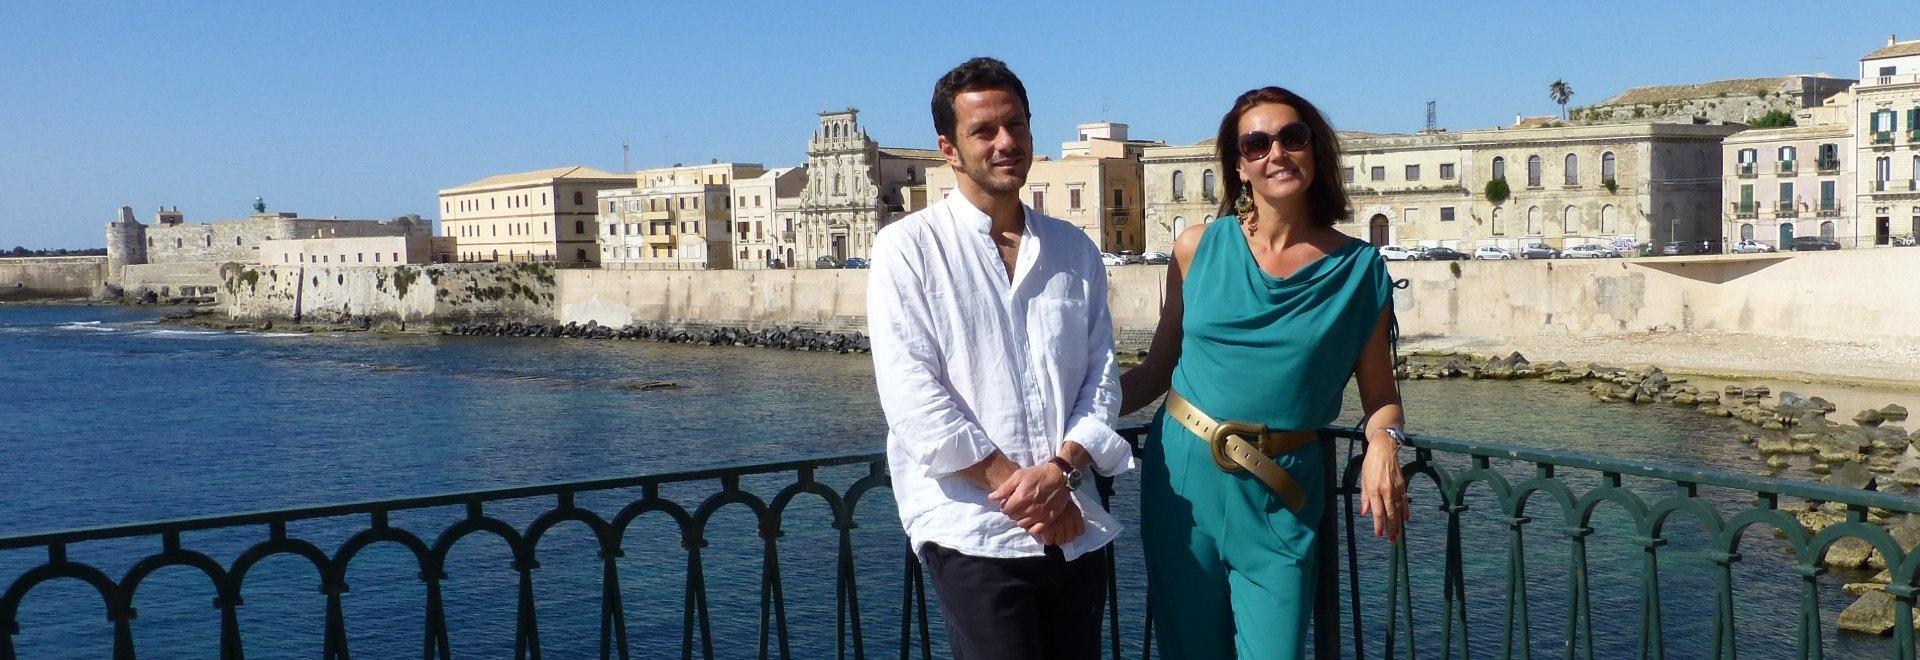 Sardegna: Isola Smeralda